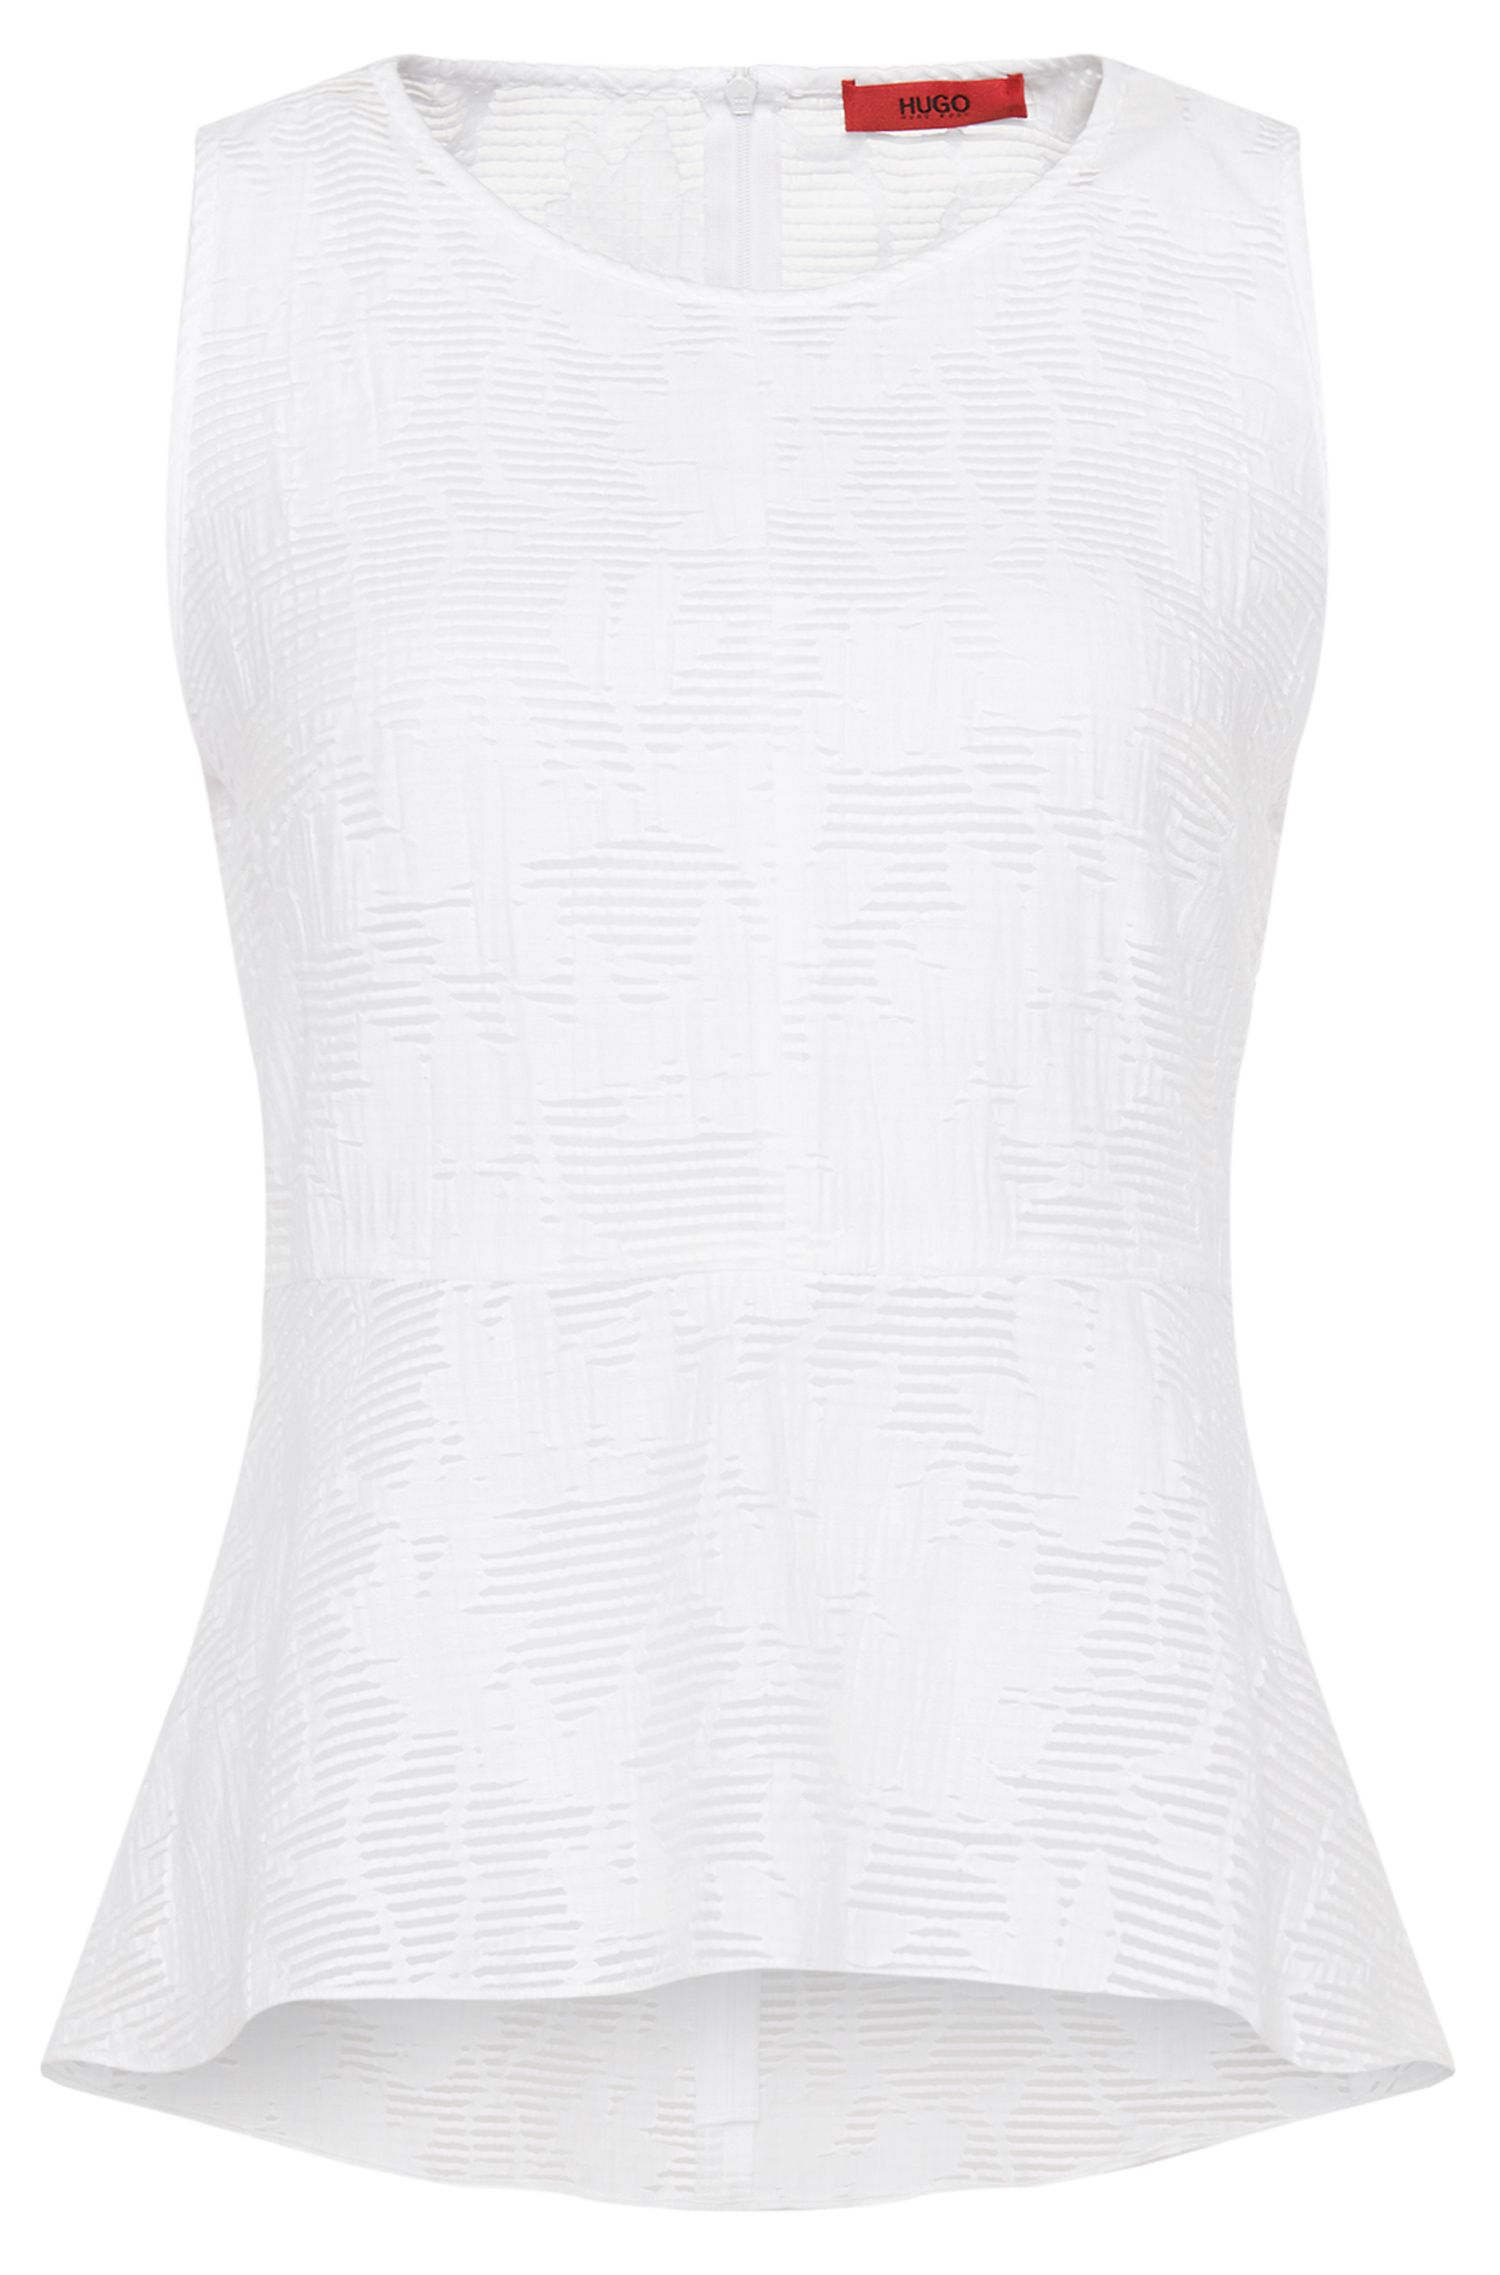 'Cindis' | Cotton Blend Semi-Sheer Peplum Top